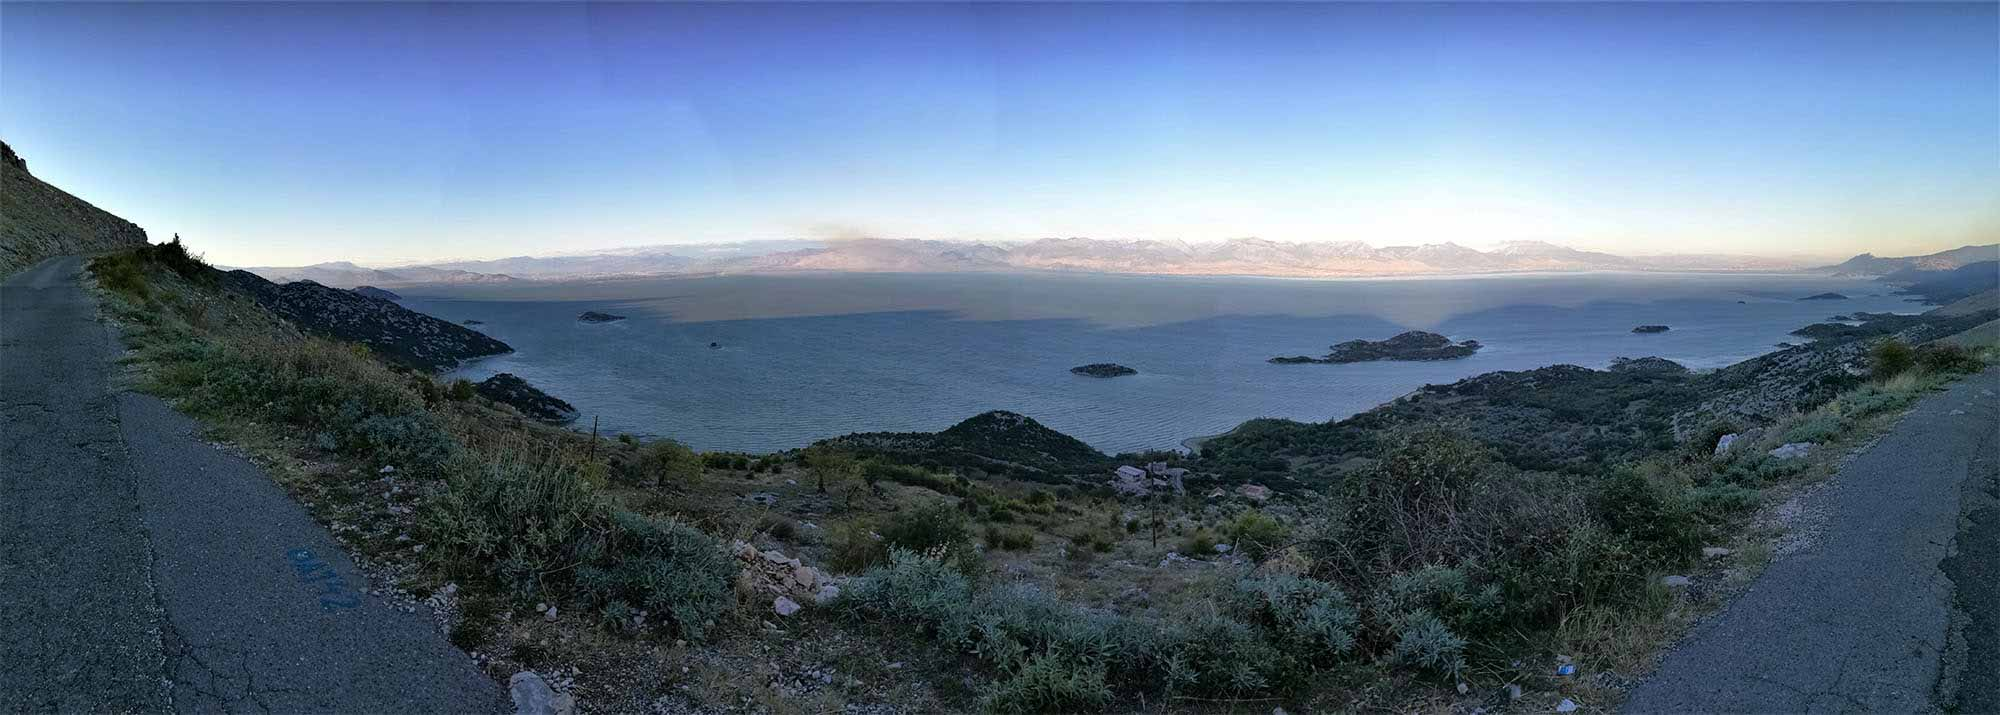 Černá Hora, Skadarské jezero, Virpazar